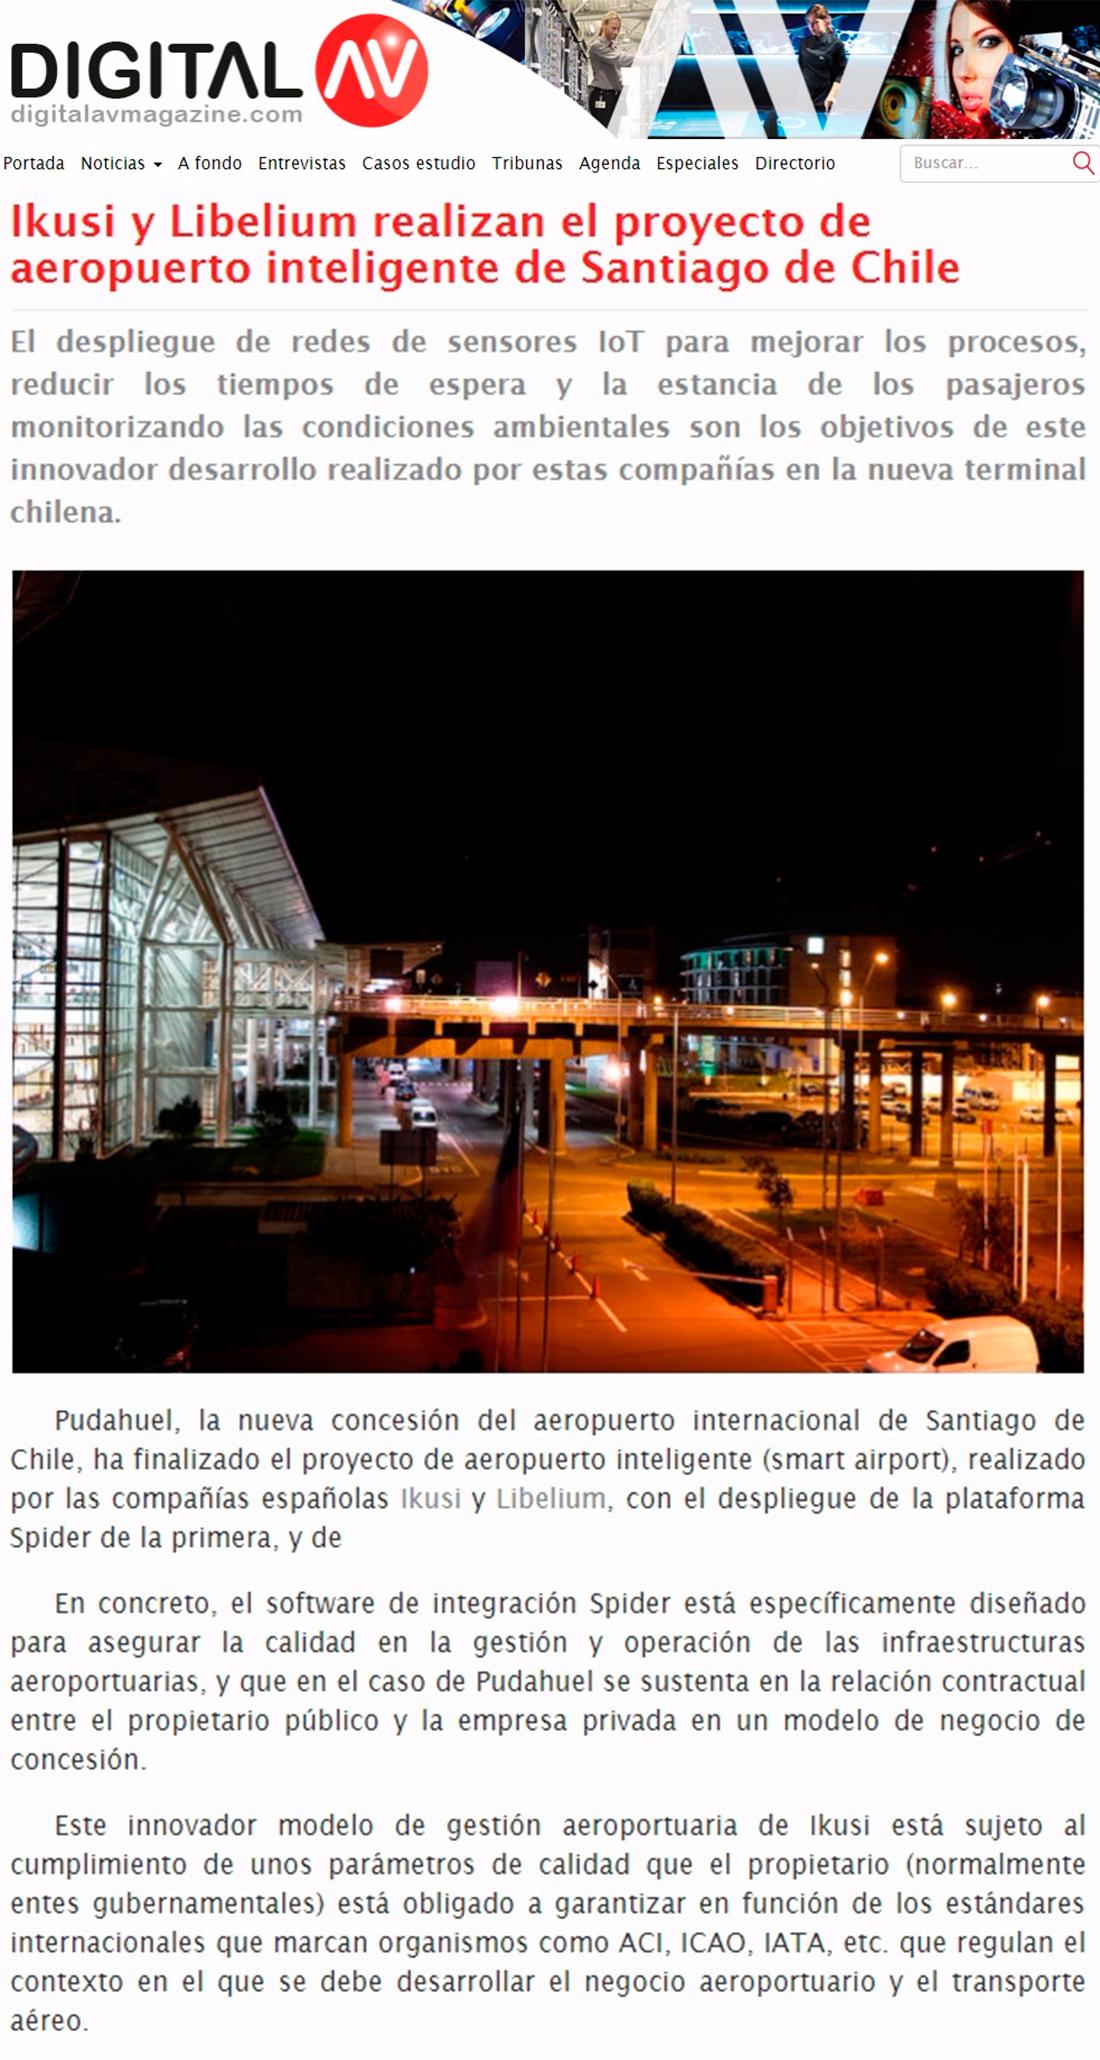 Digital AV Magazine –Proyecto de aeropuerto inteligente en Chile